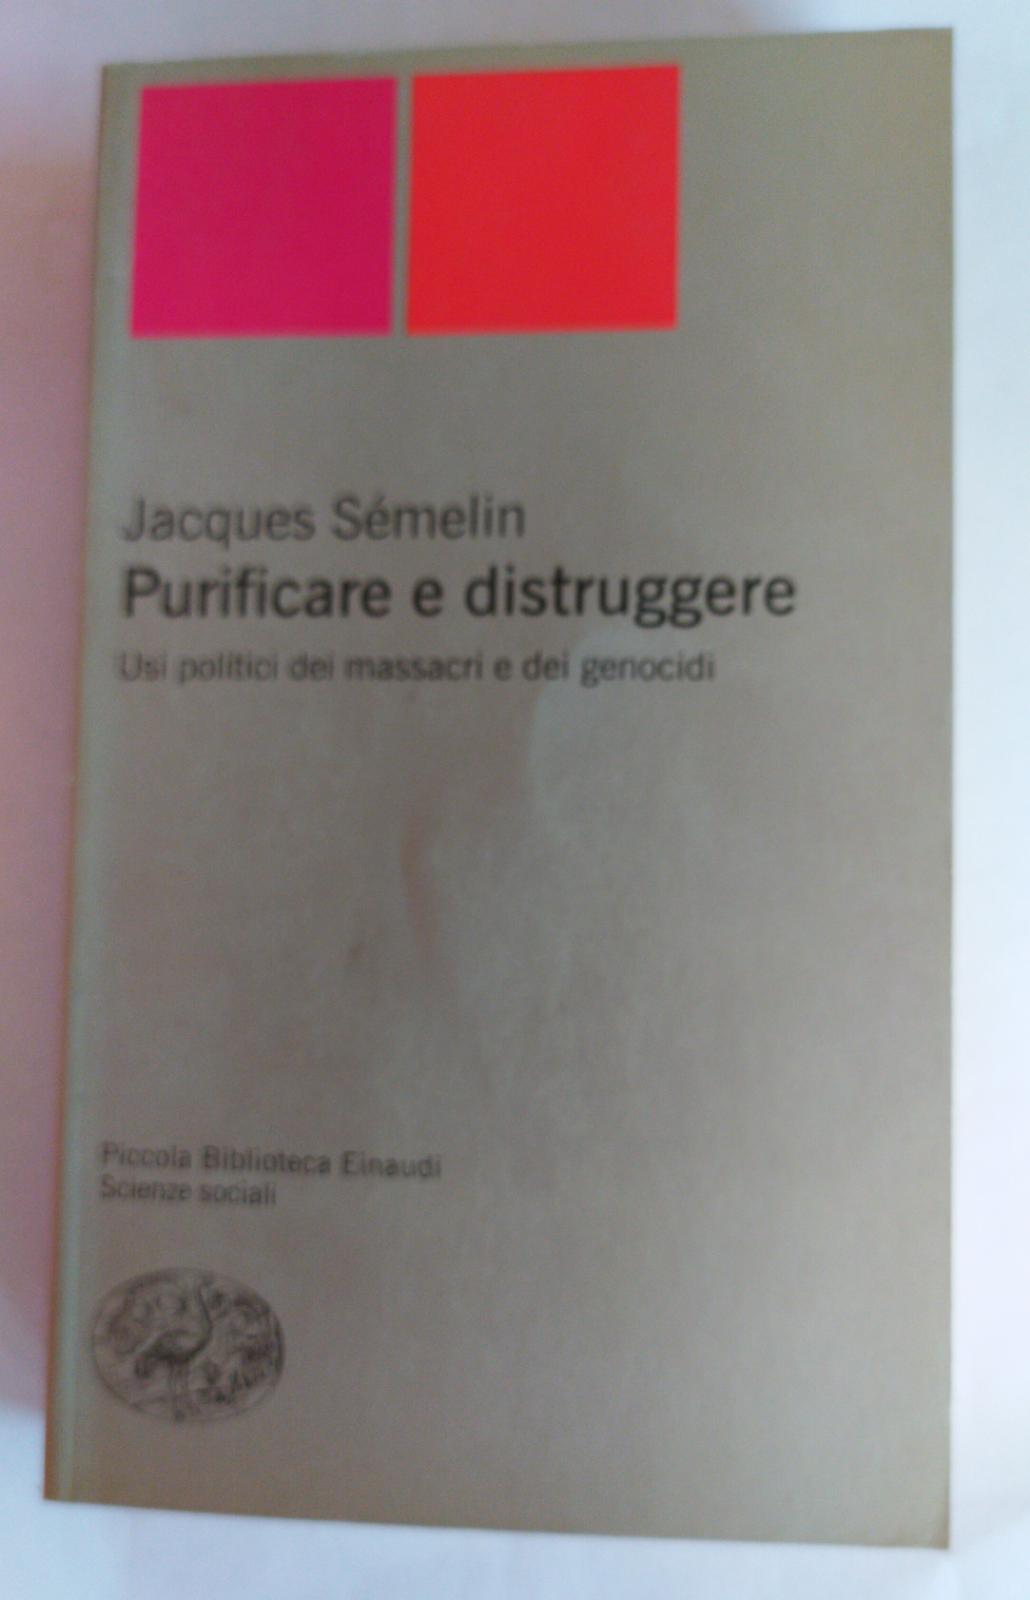 Purificare e distruggere - Jacques Semelin